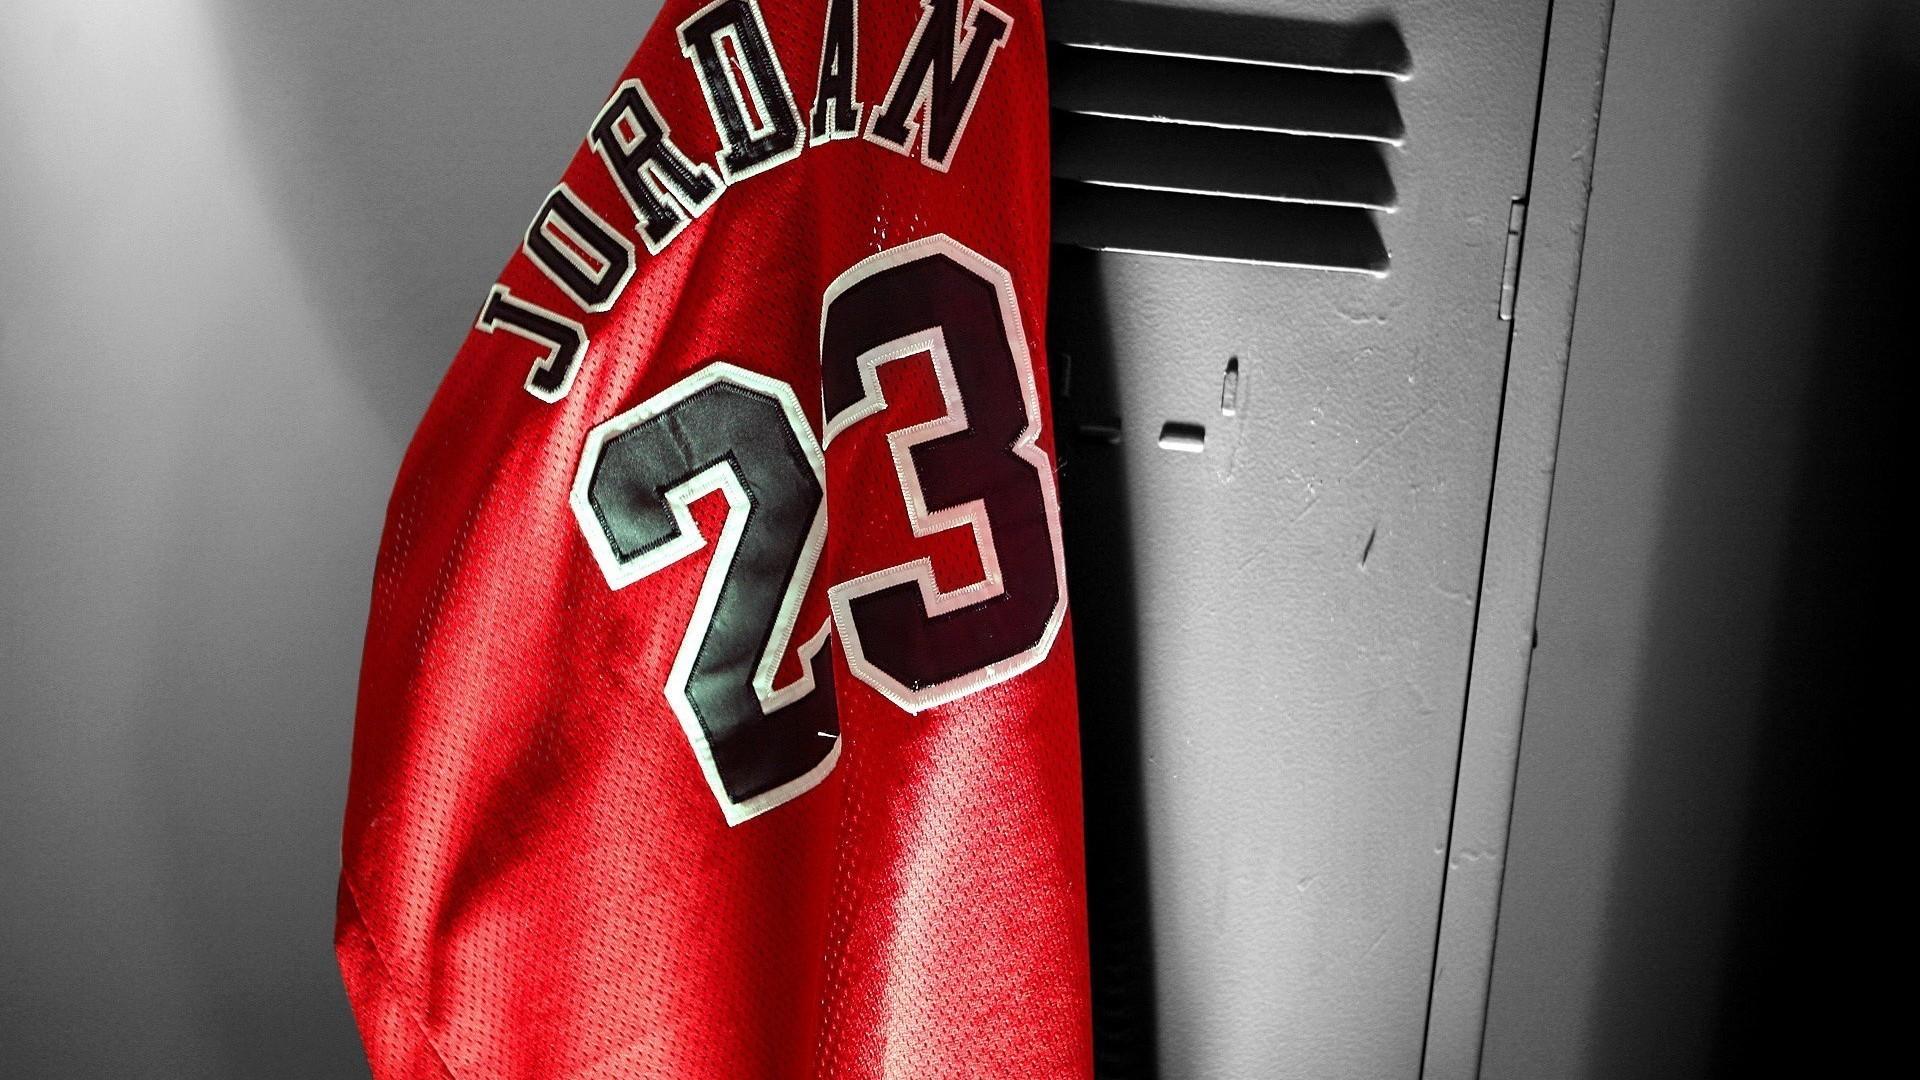 Michael-Jordan-Tshirt-Chicago-Bulls-Wallpaper-by-Arturo.